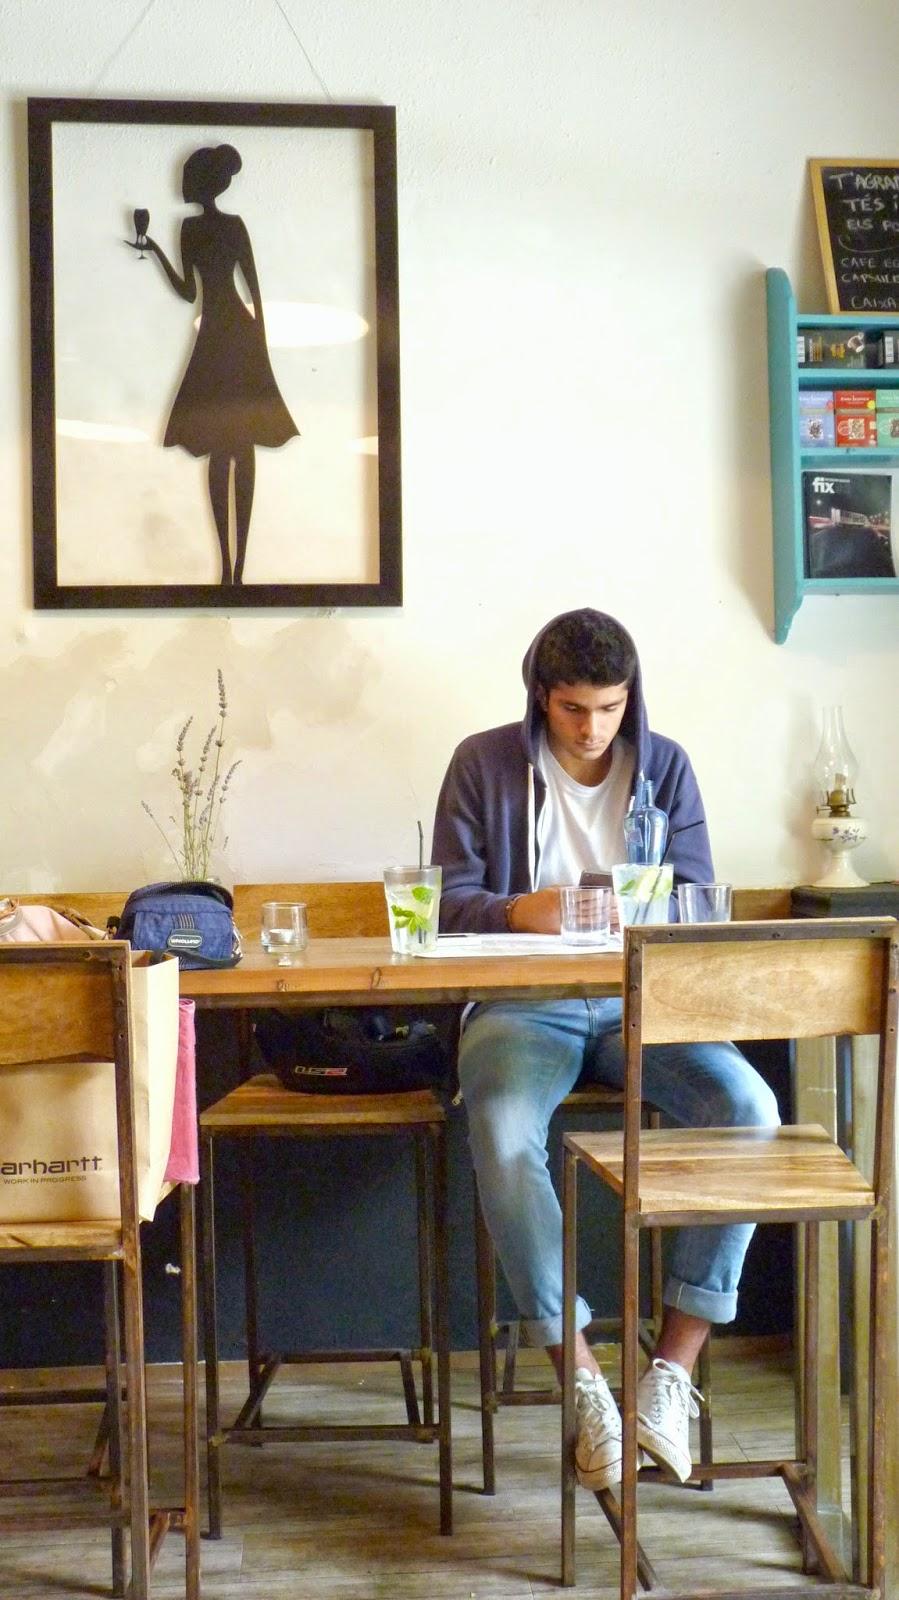 Copasetic, restaurante sin gluten